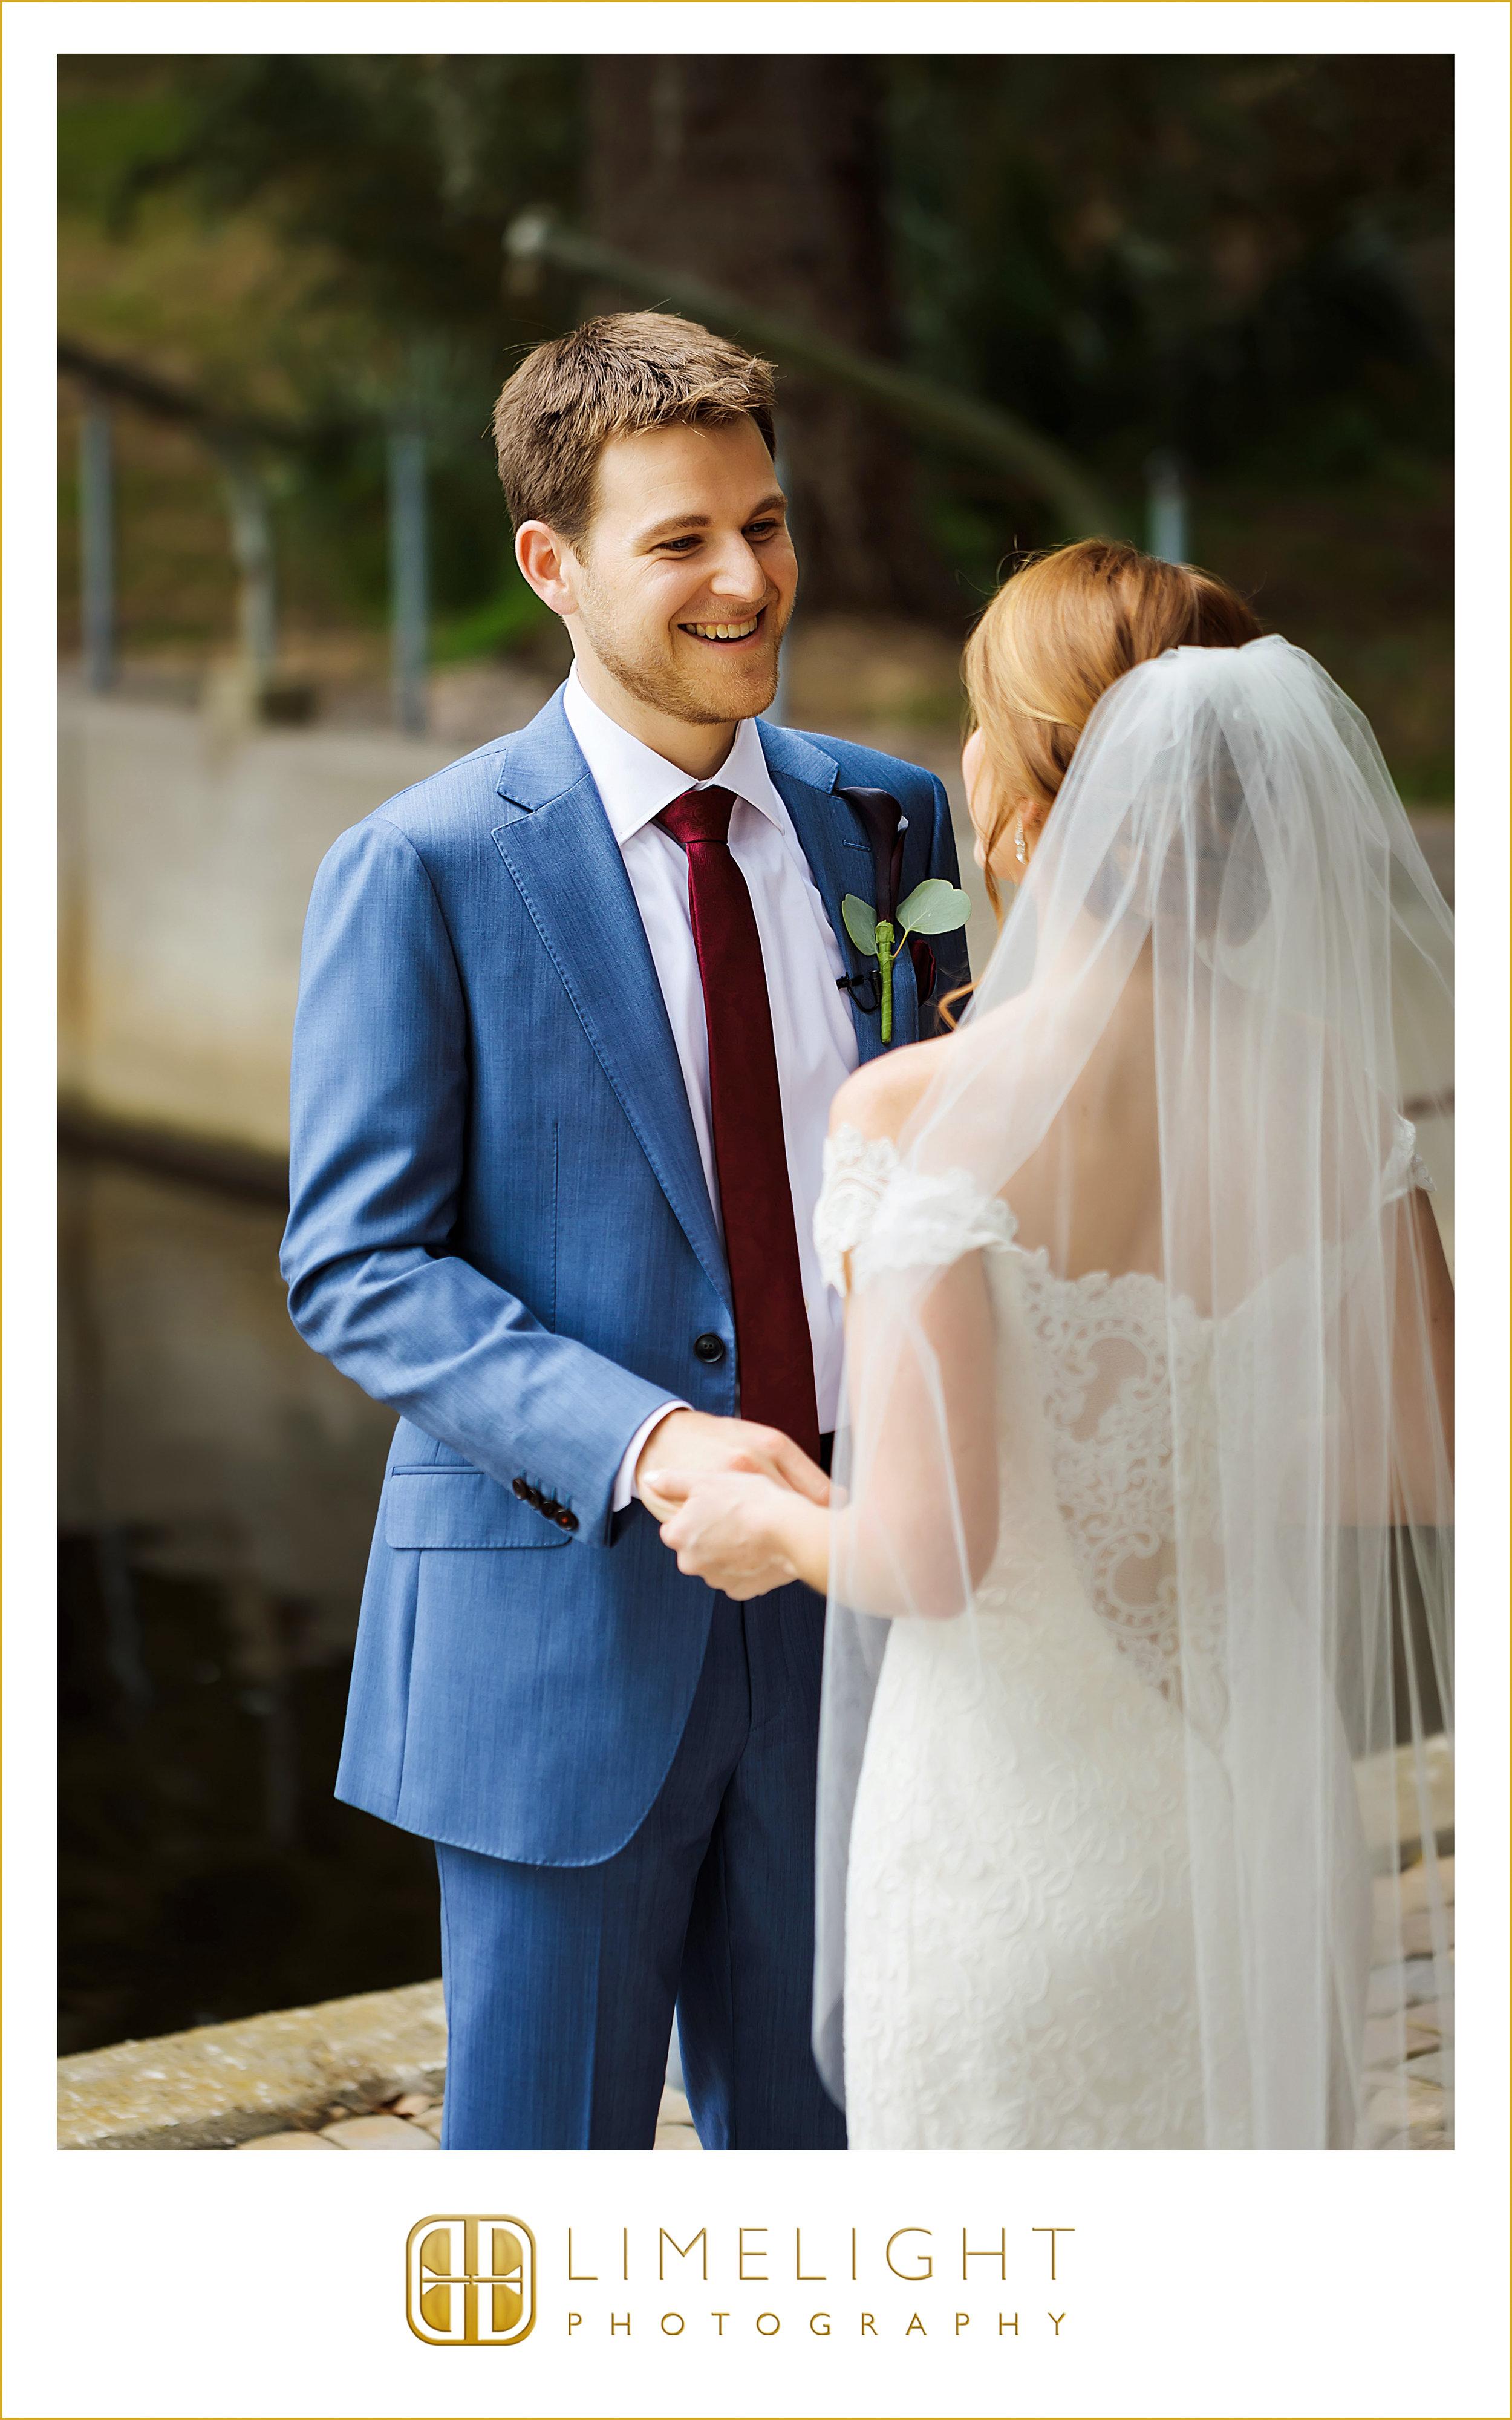 Copy of Portrait | Mr. & Mrs. | Wedding